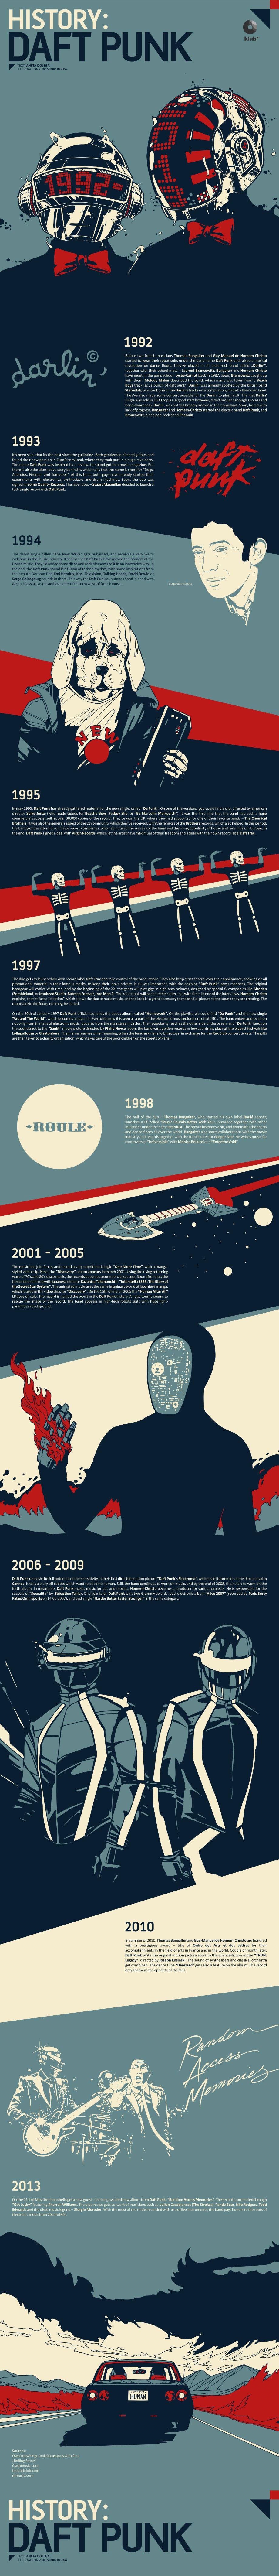 ozedm-Daft-Punk-infographic